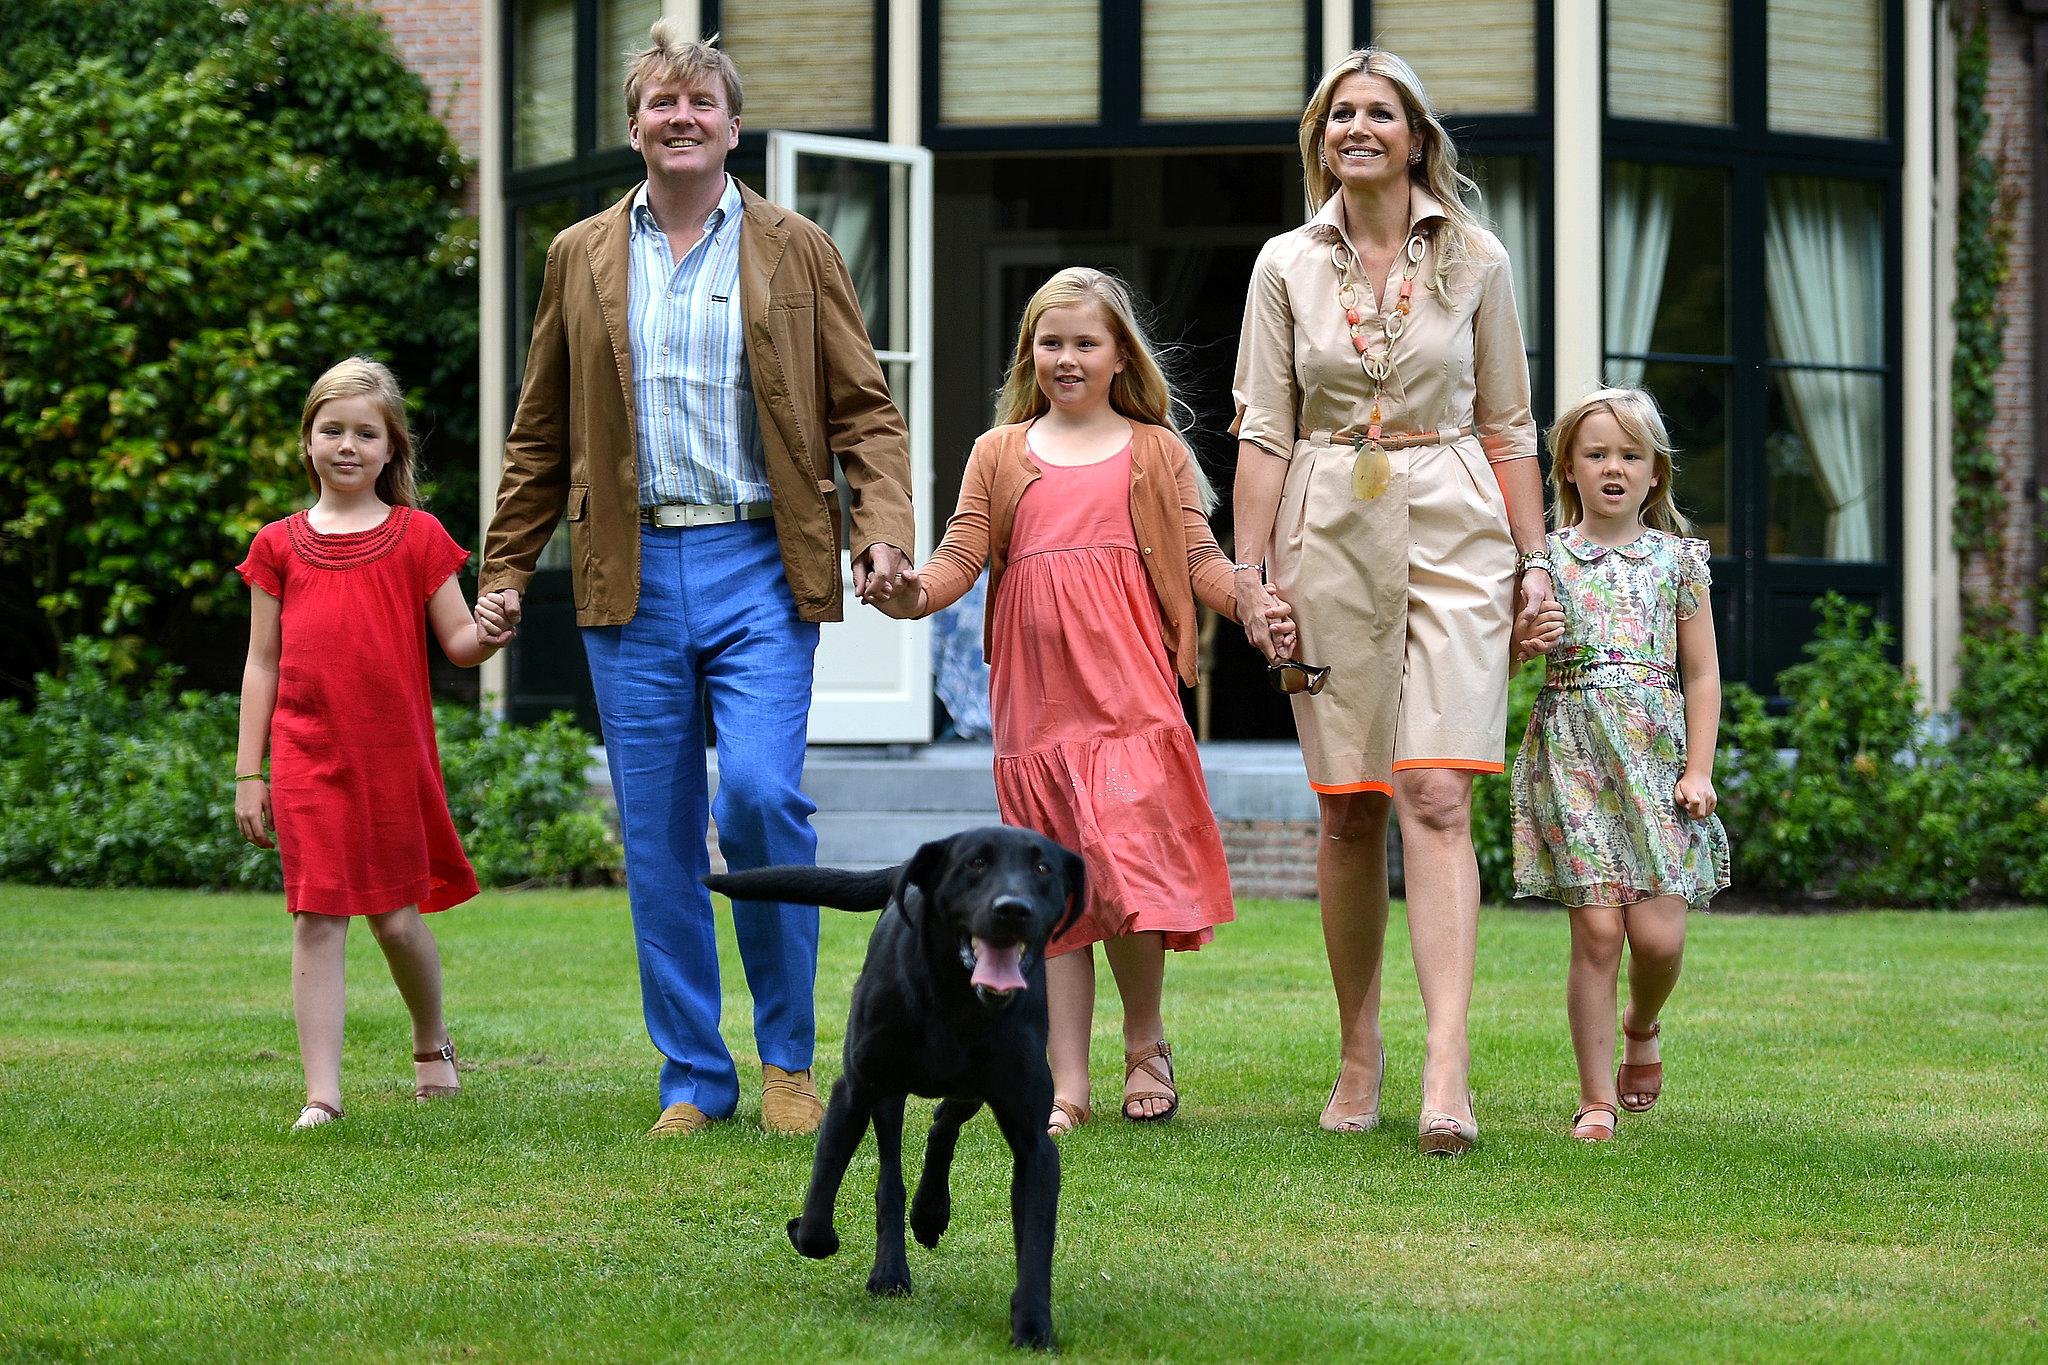 King Willem-Alexander, Queen Maxima, their dog Skipper, and the girls walked at Horsten Estate in Wassenaar.